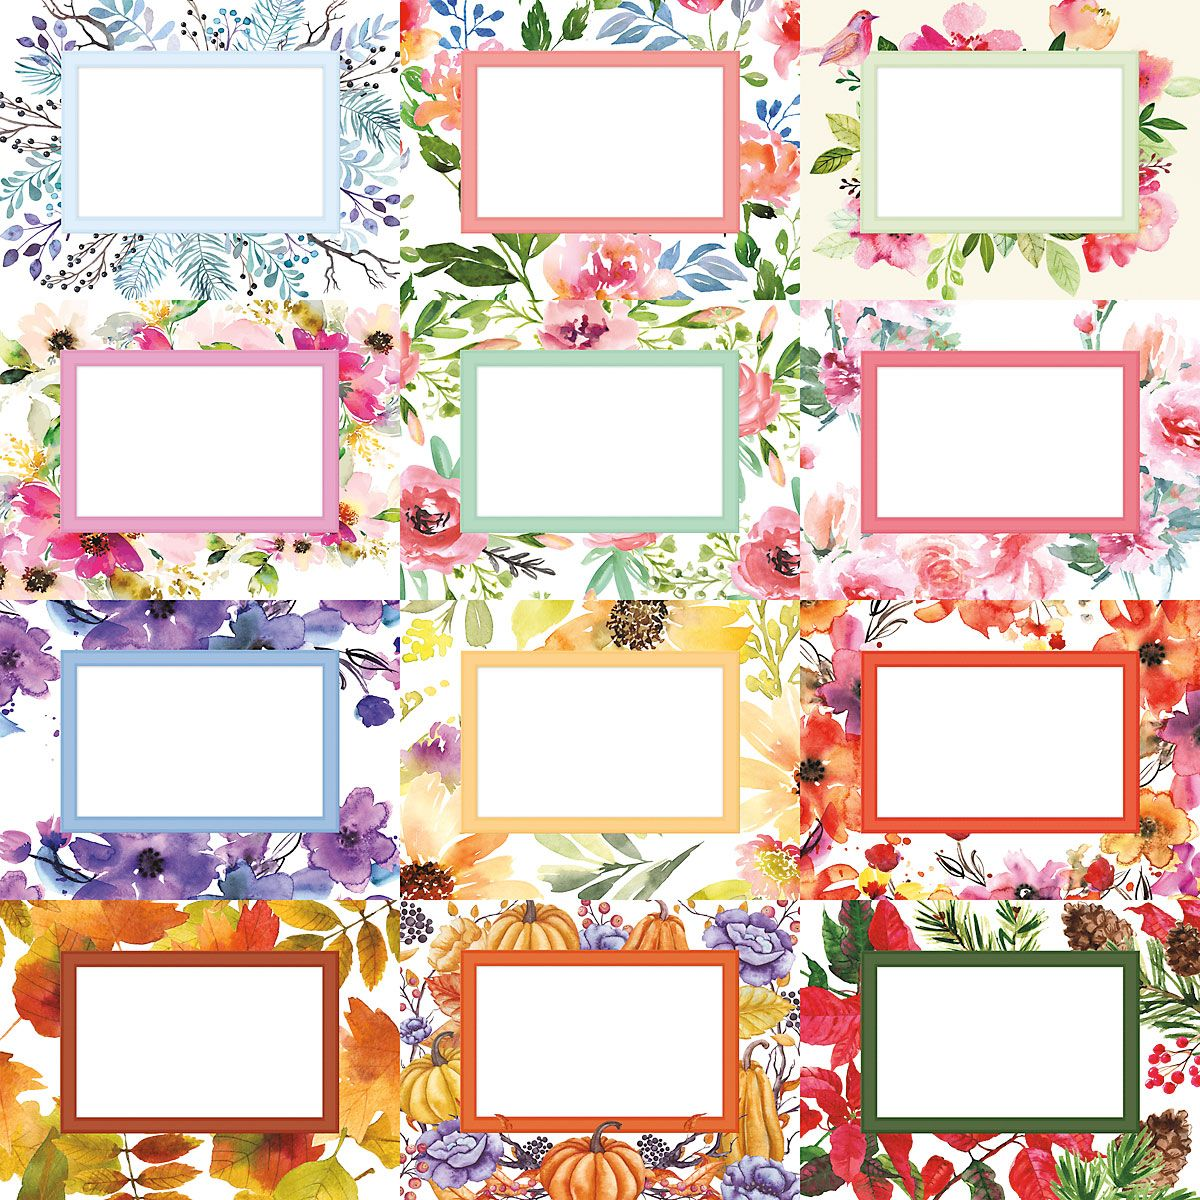 2019 Floral Photo Scrapbook Wall Calendar